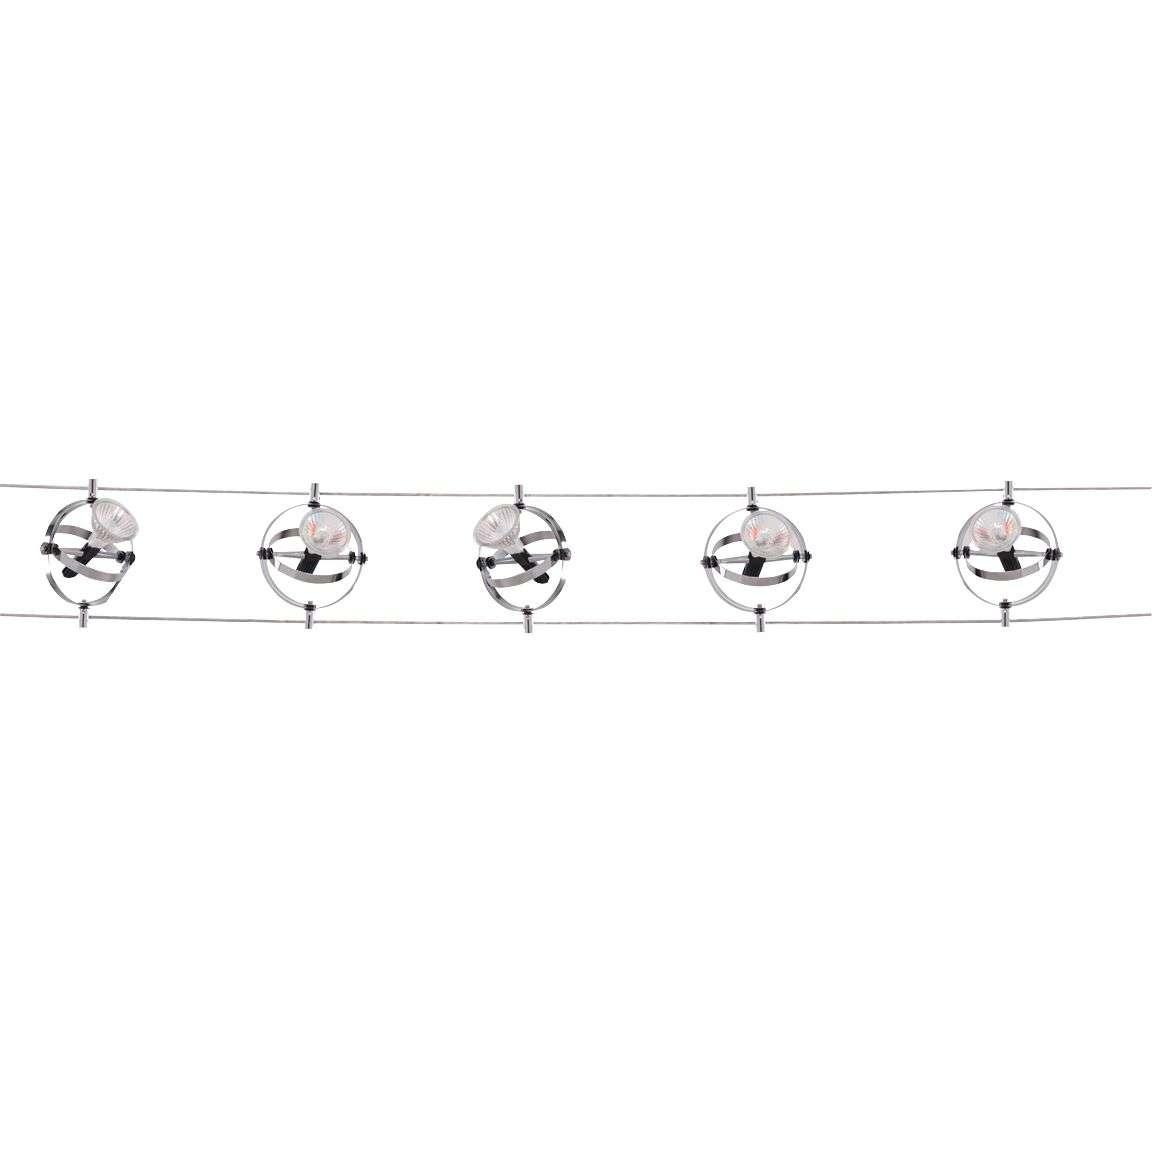 5601-05-LED 5 Light LED Cable Kit Adjustable Gyroscope Heads Chrome